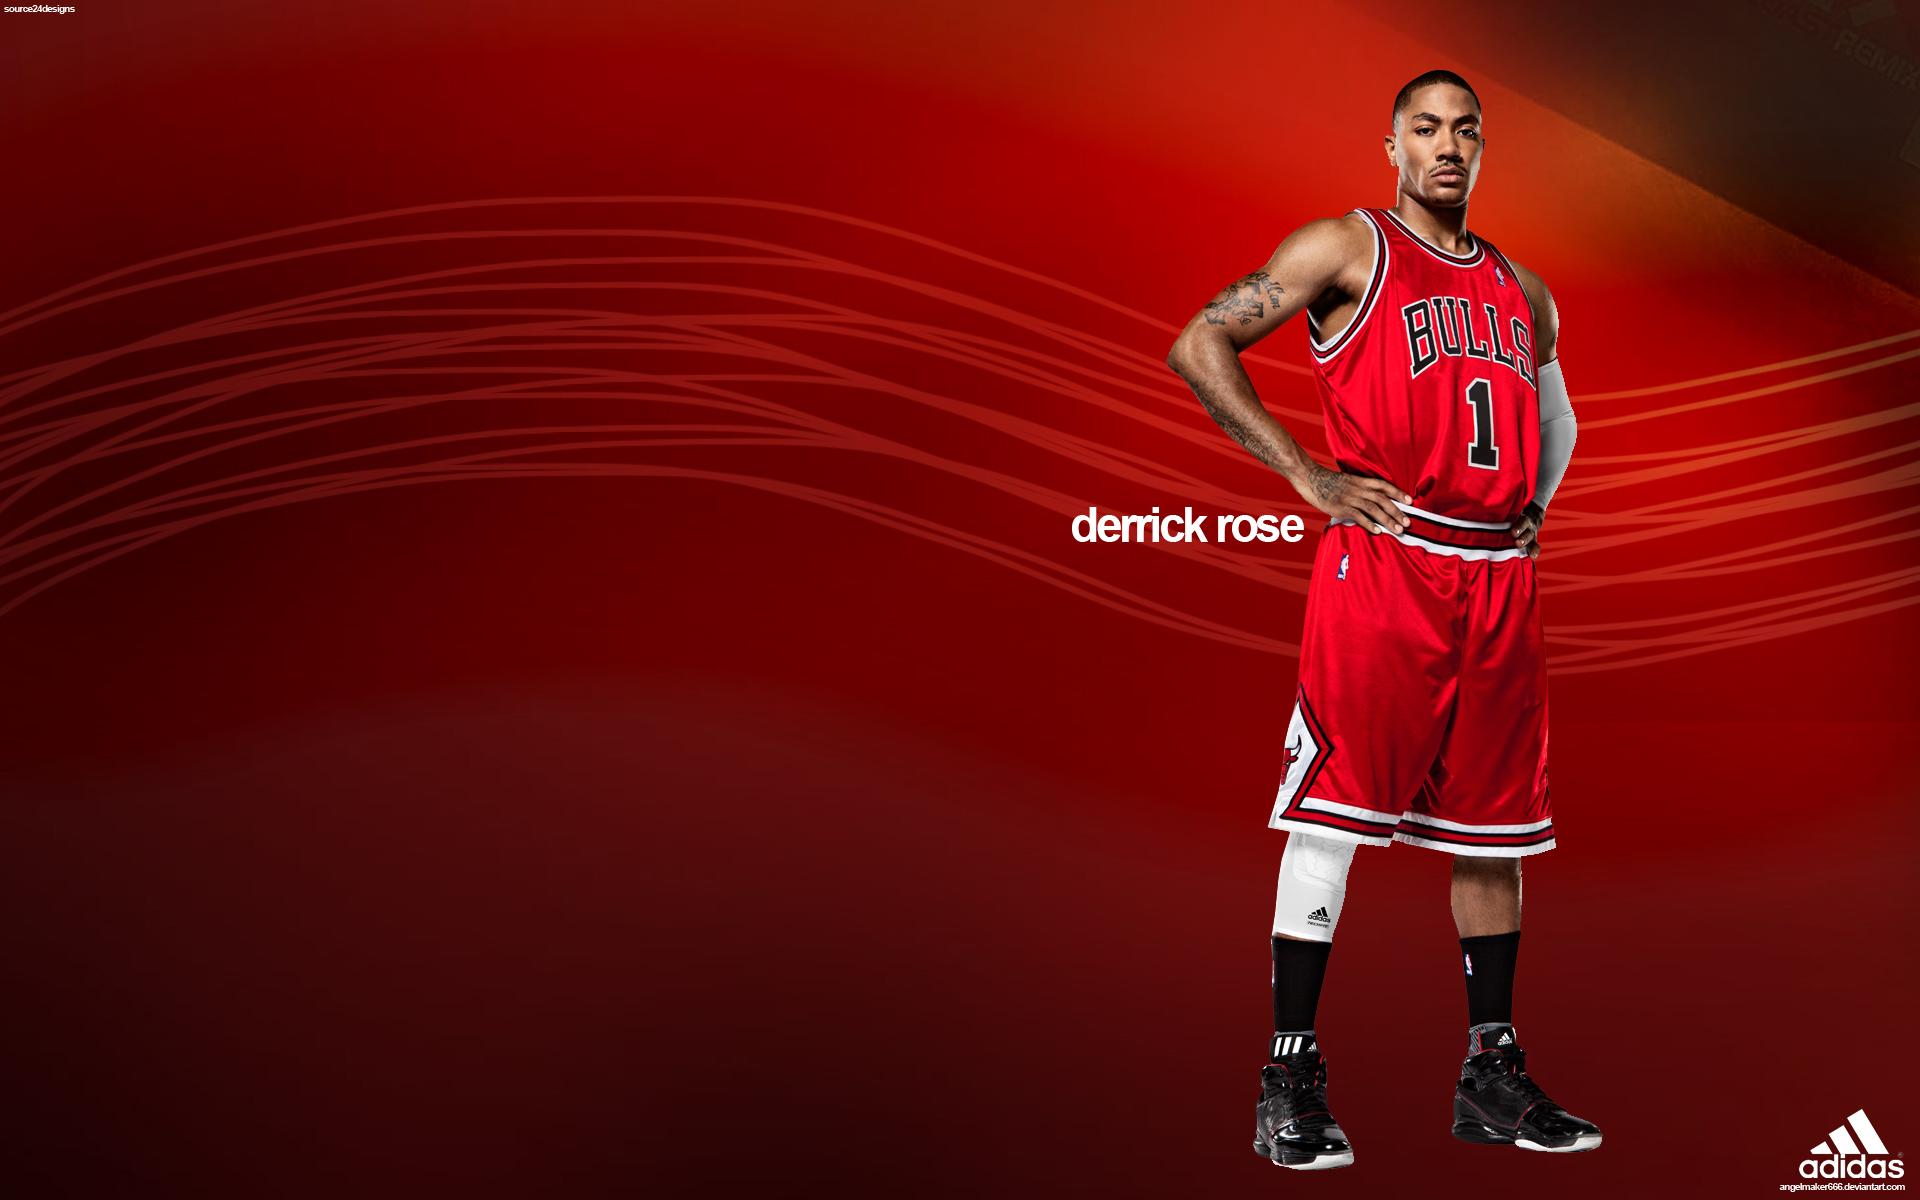 Adidas Derrick Rose Shoes Tosh